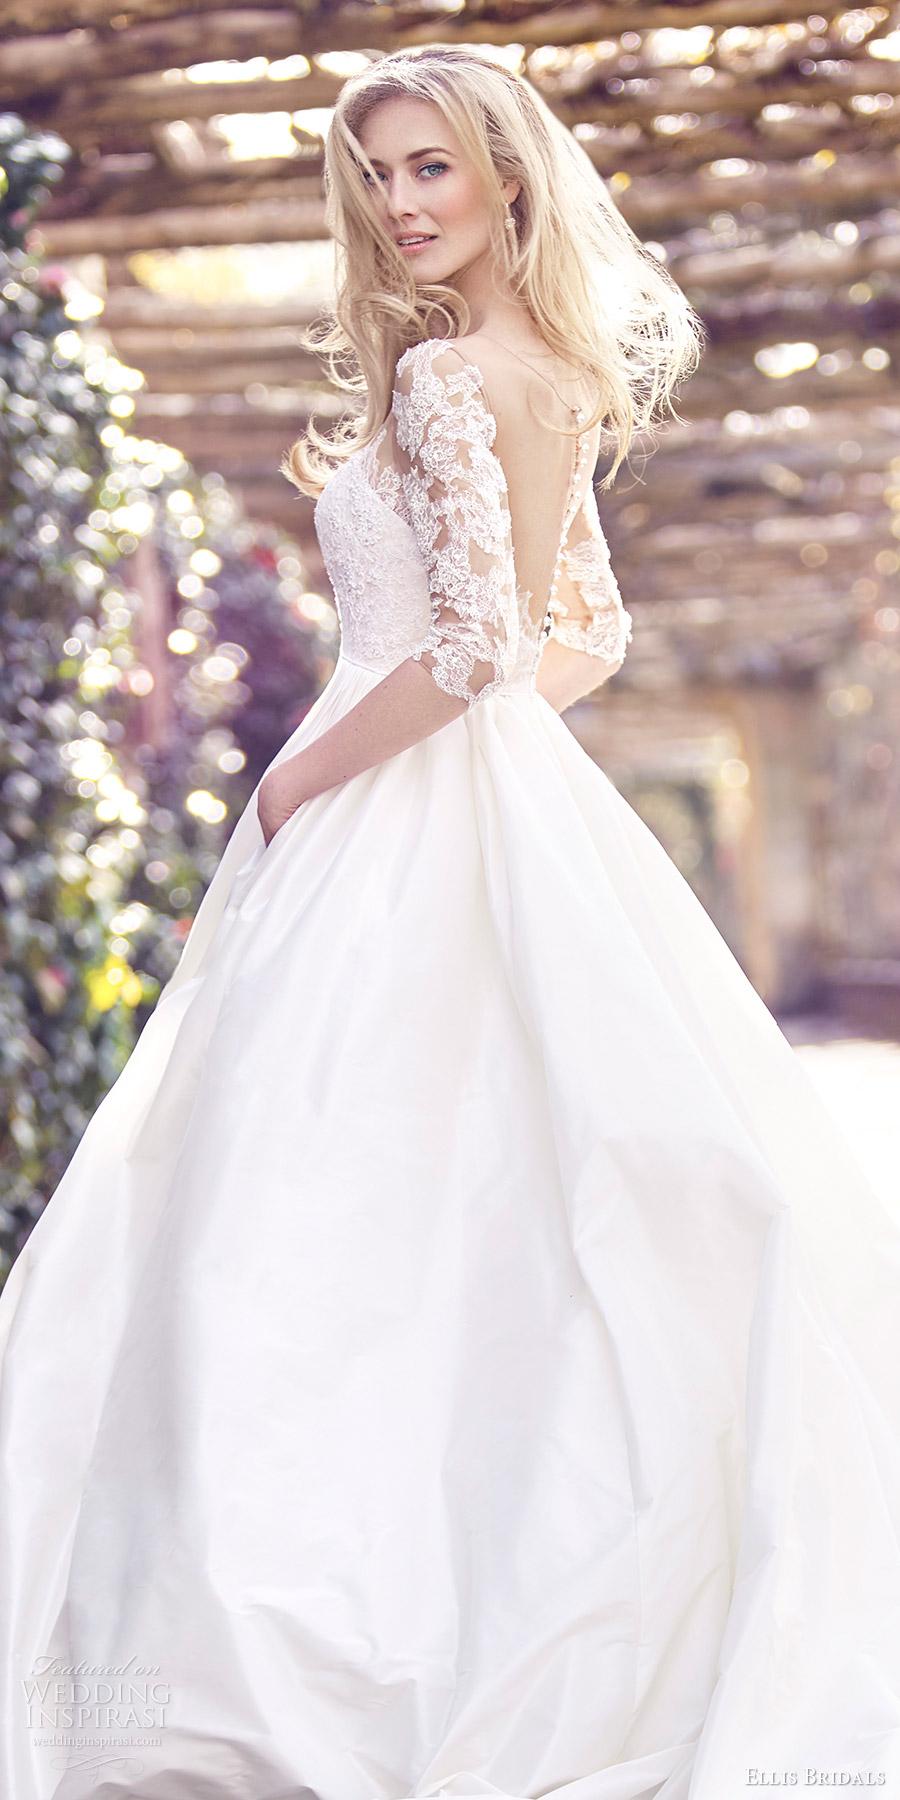 Ellis Bridals 2016 3 Quarter Sleeves Sweetheart Illusion Jewel Corset Ball Gown Wedding Dress 18023